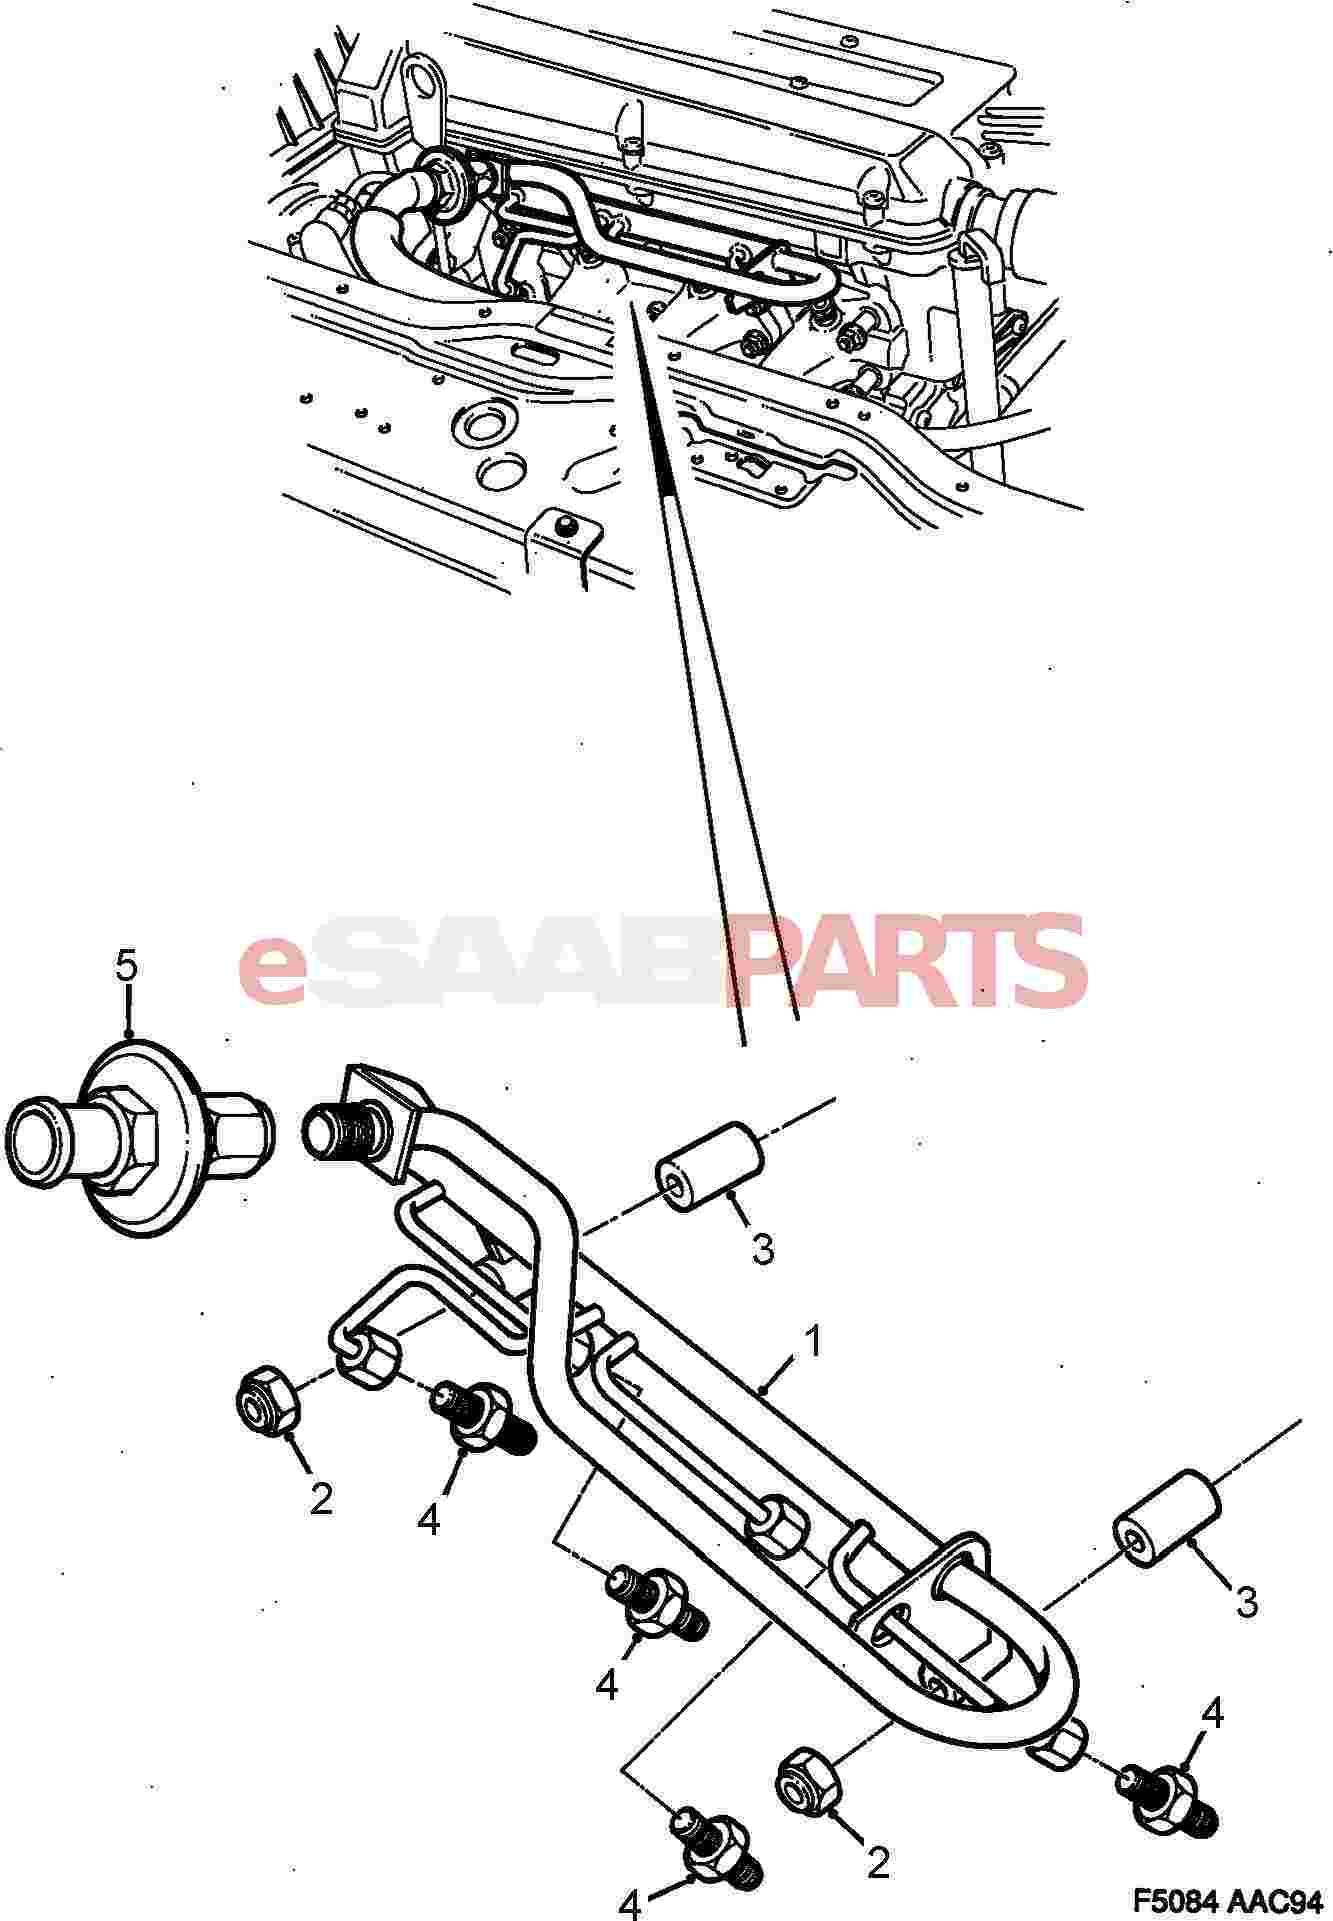 hight resolution of check valve part diagram